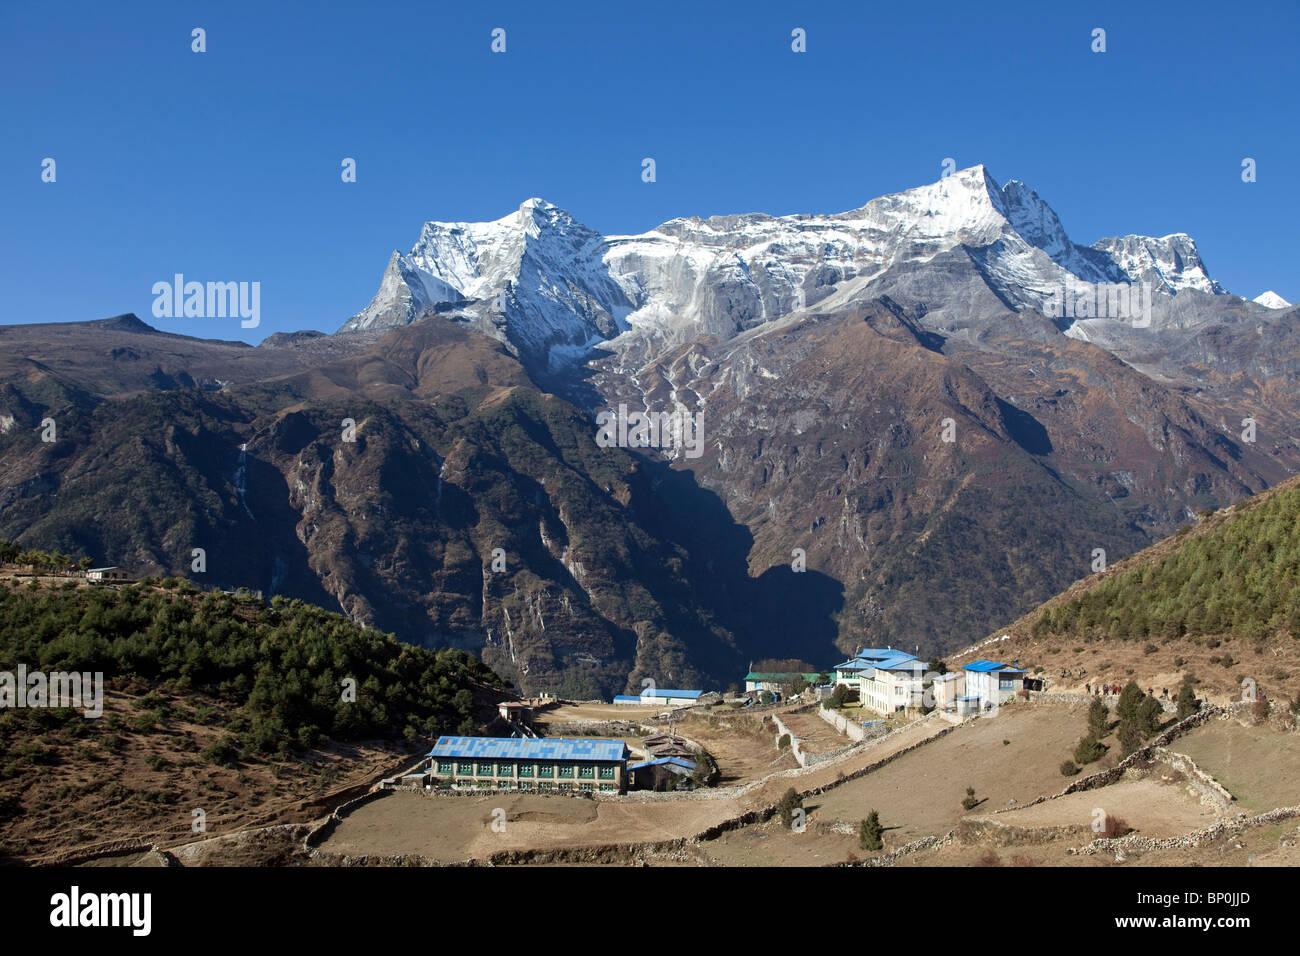 Nepal, Everest Region, Namche Bazaar, Khumbu Valley. The last town of any size on the Everest Base Camp trek - Stock Image